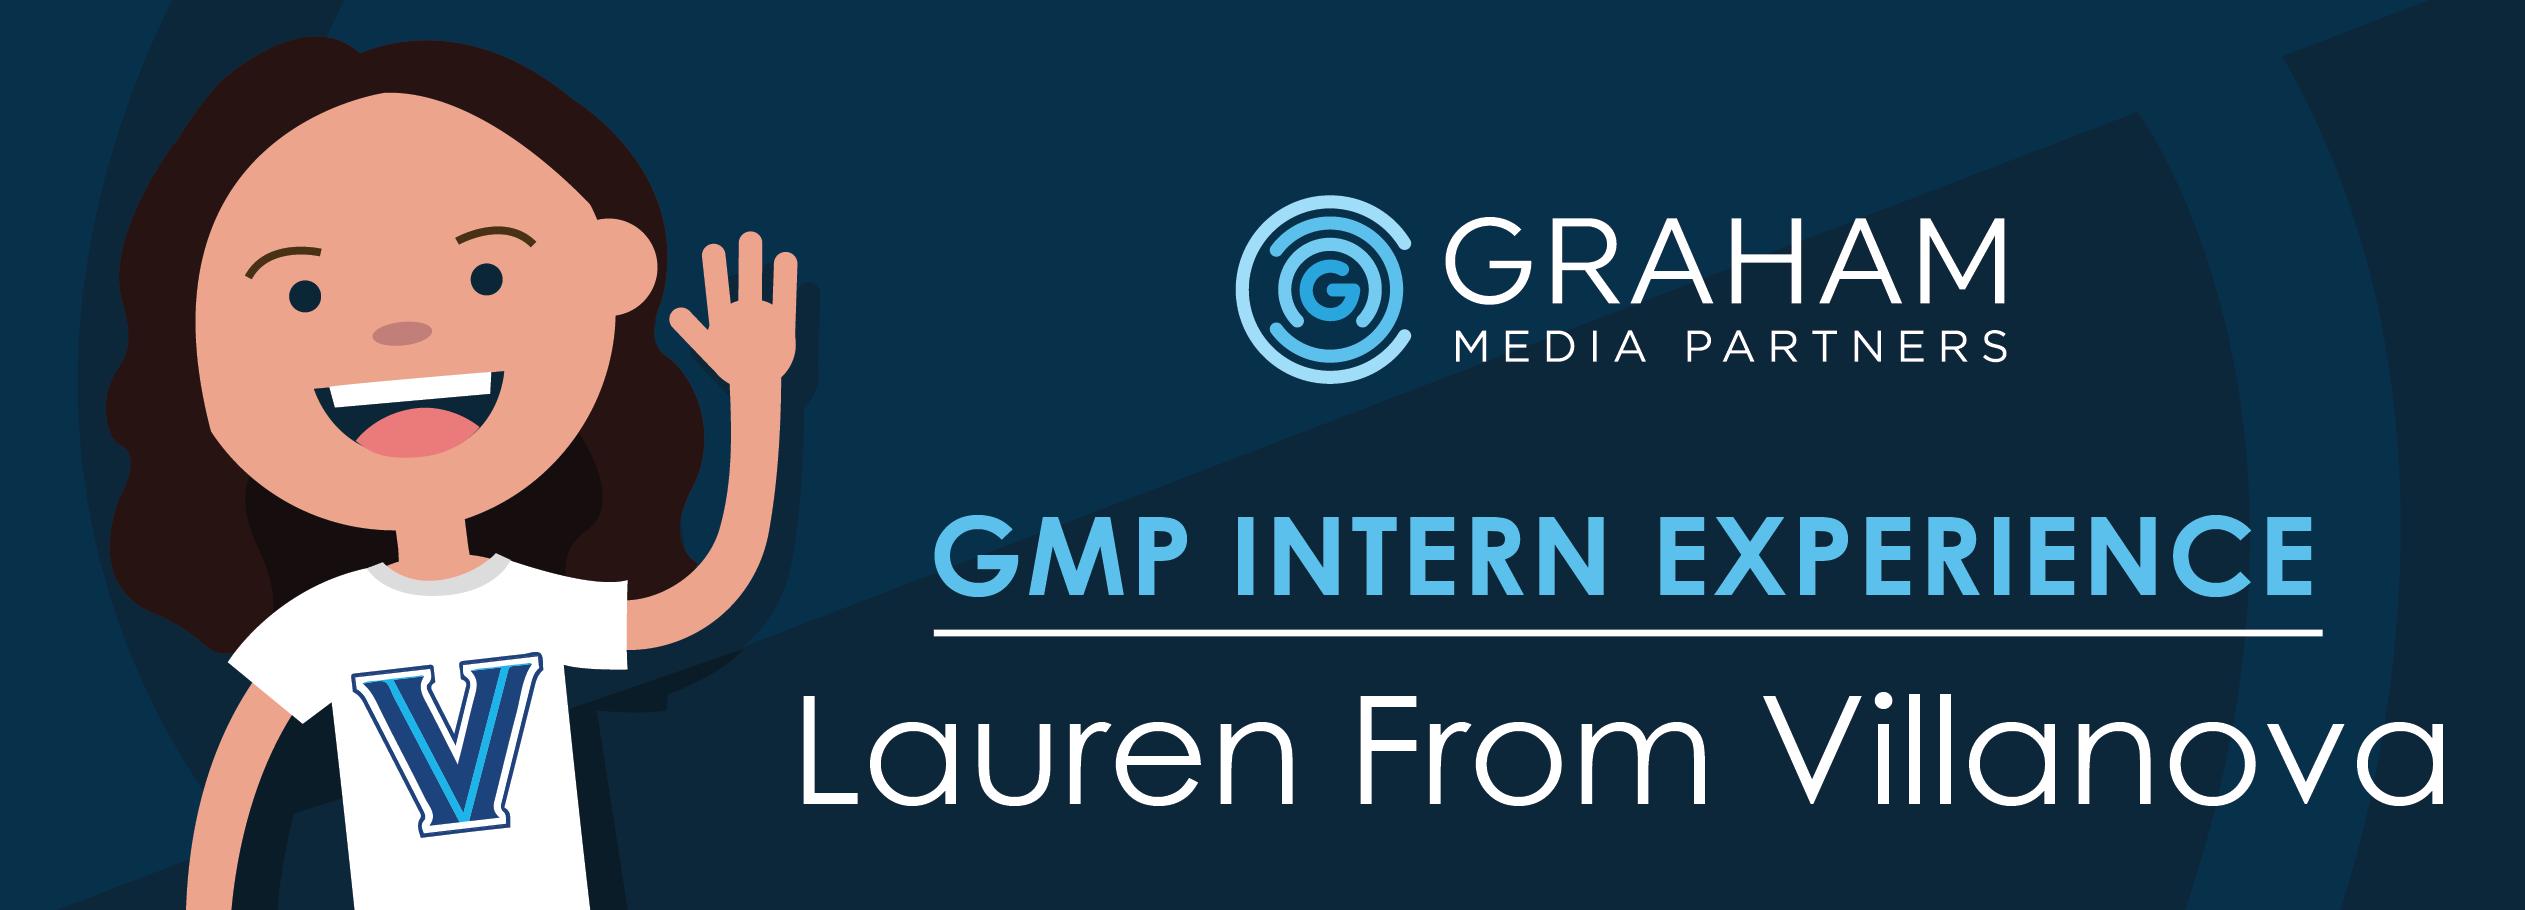 Intern Experience: Lauren from Villanova